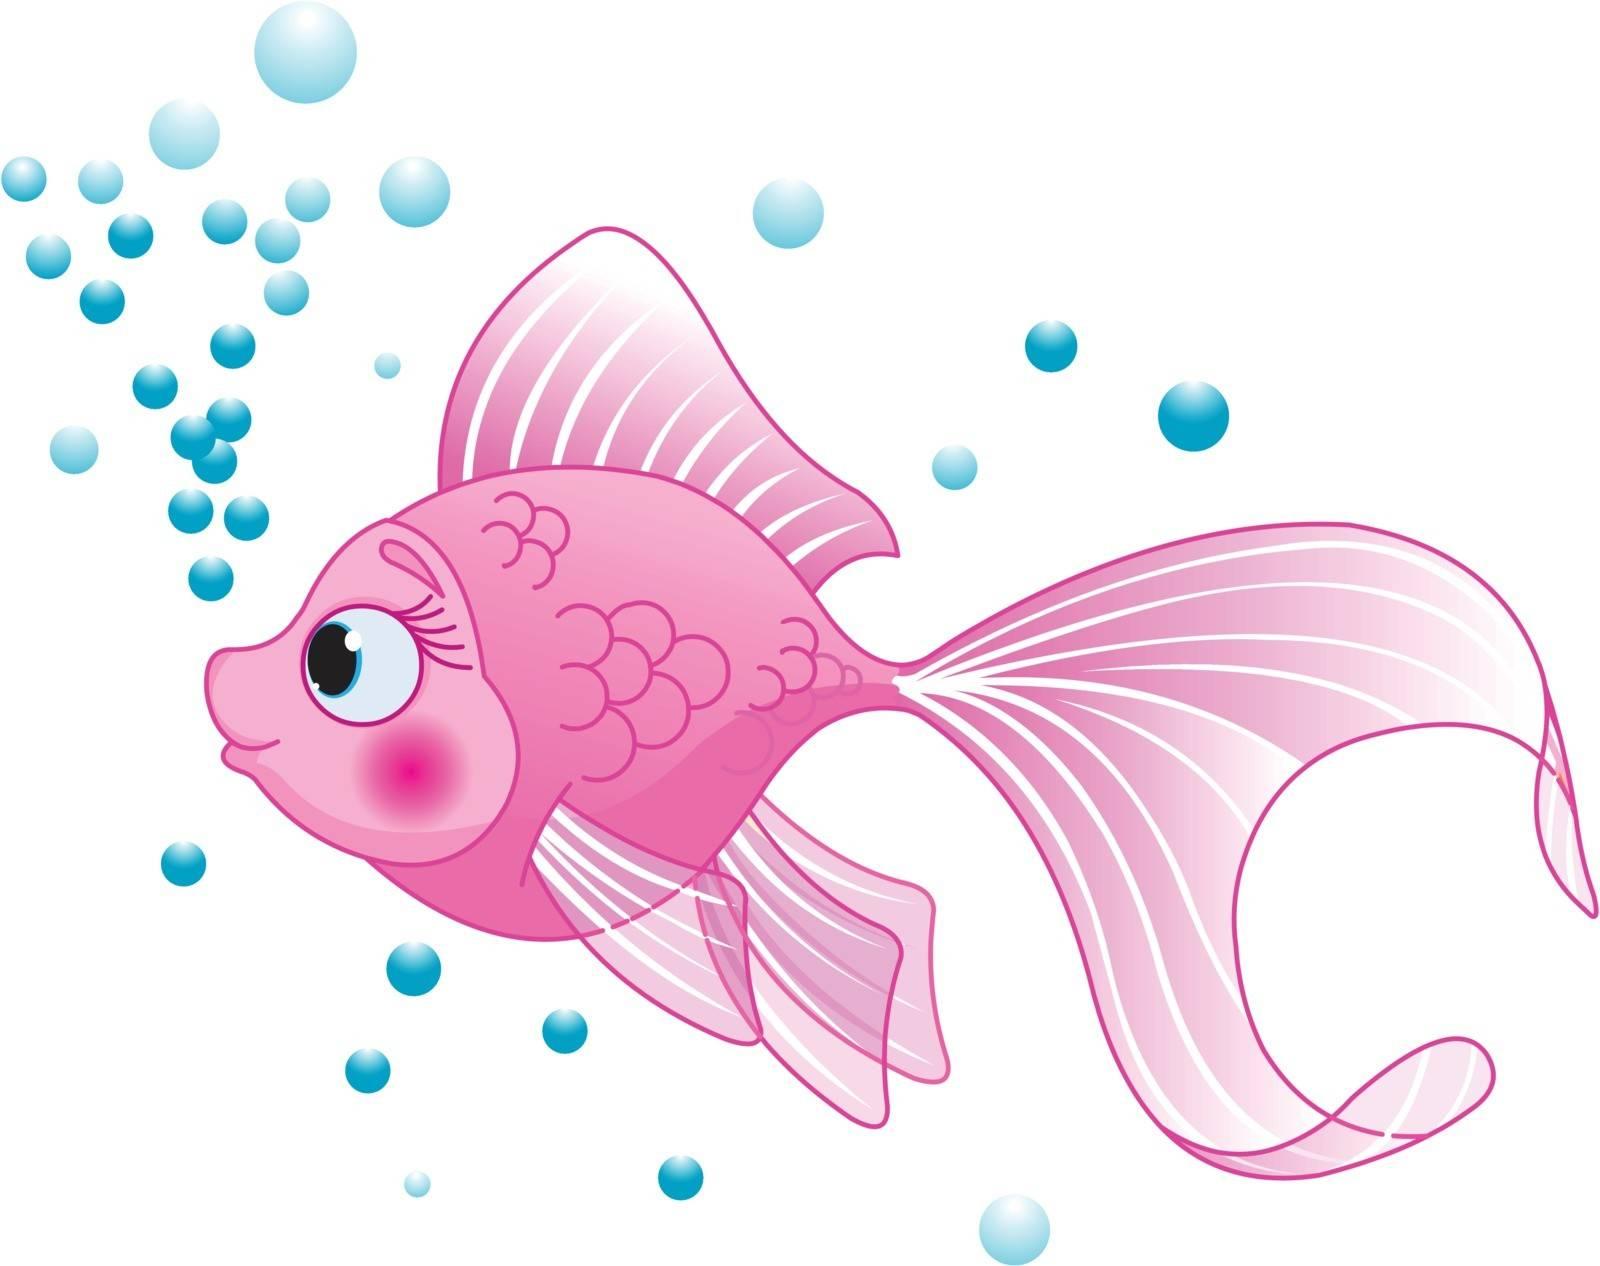 Illustration of cute pink fish